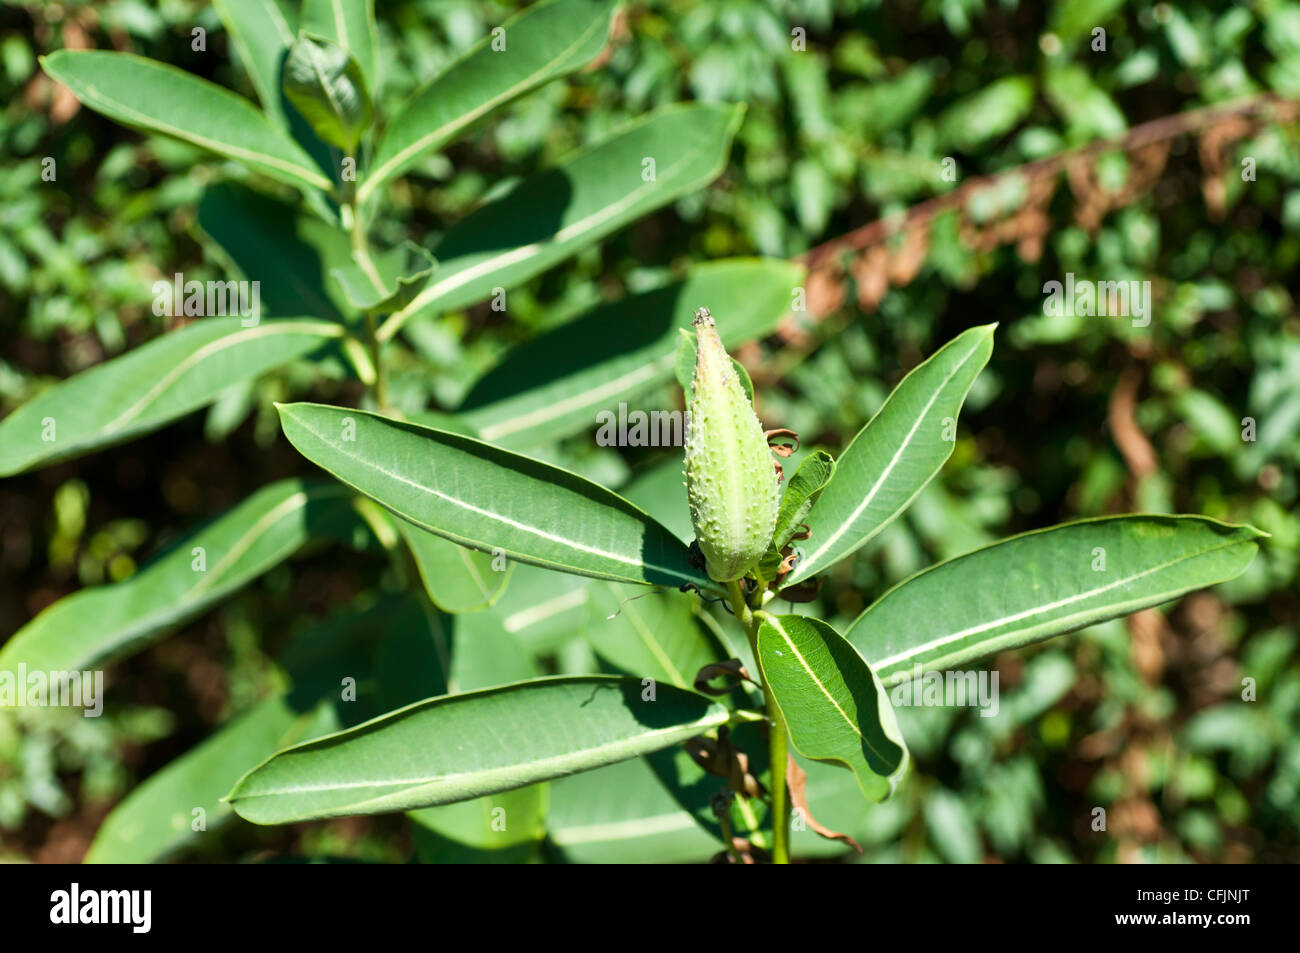 Toxic Milkweed plant, Asclepias spp, Asclepiadaceae - Stock Image